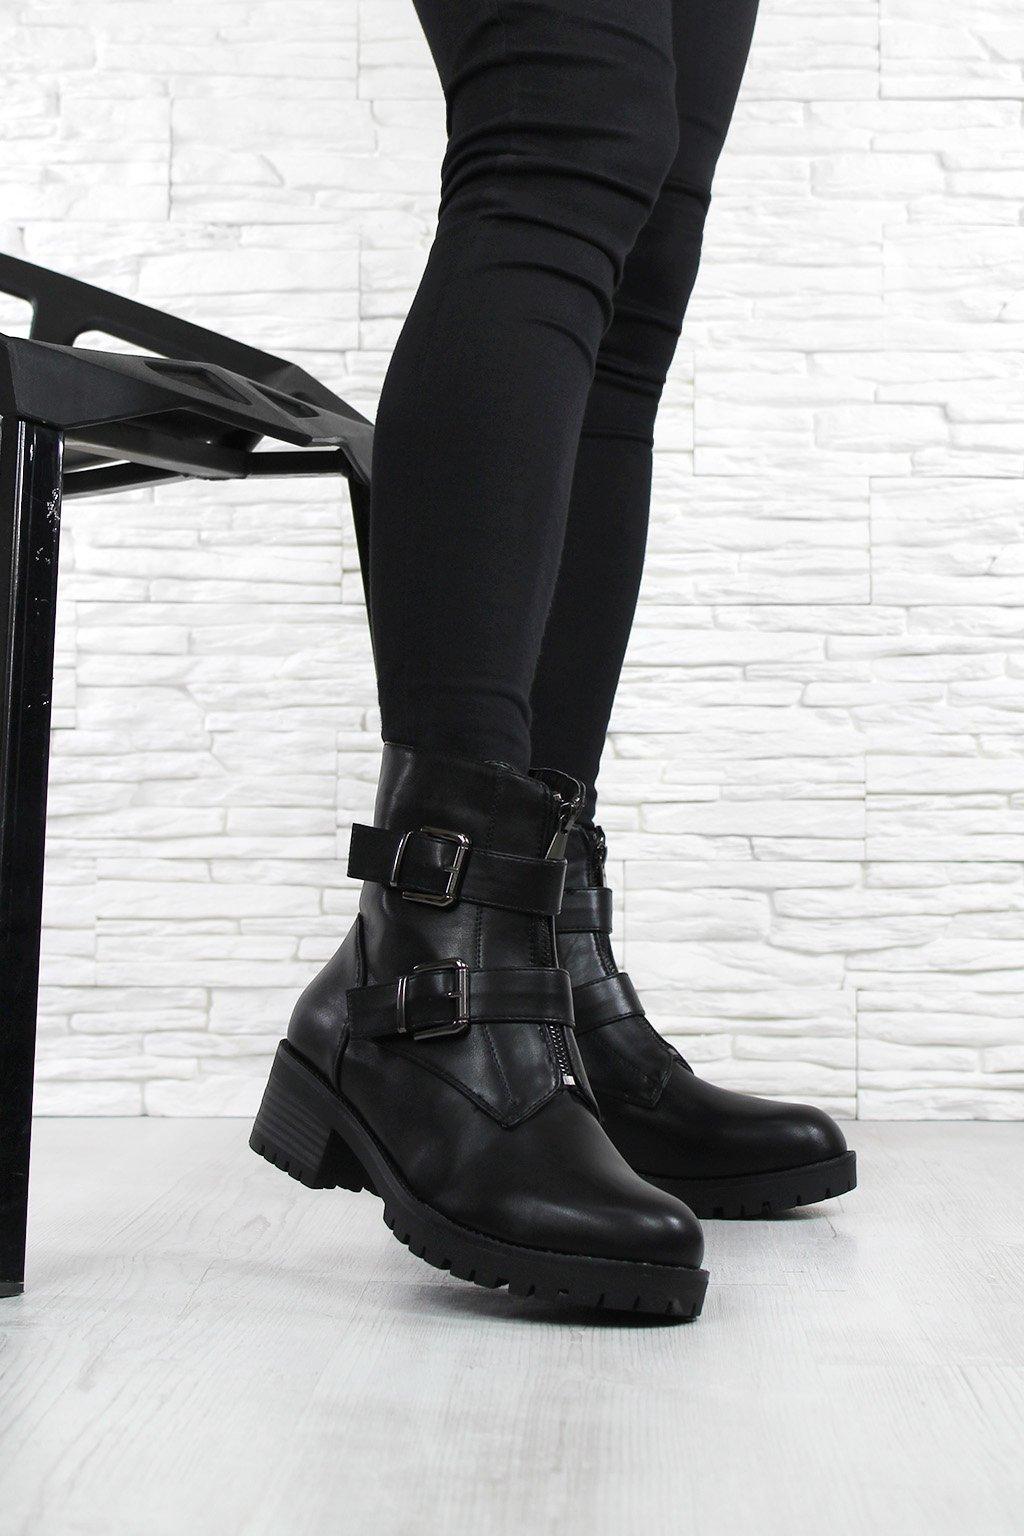 Dámské boty W118 1B (2)